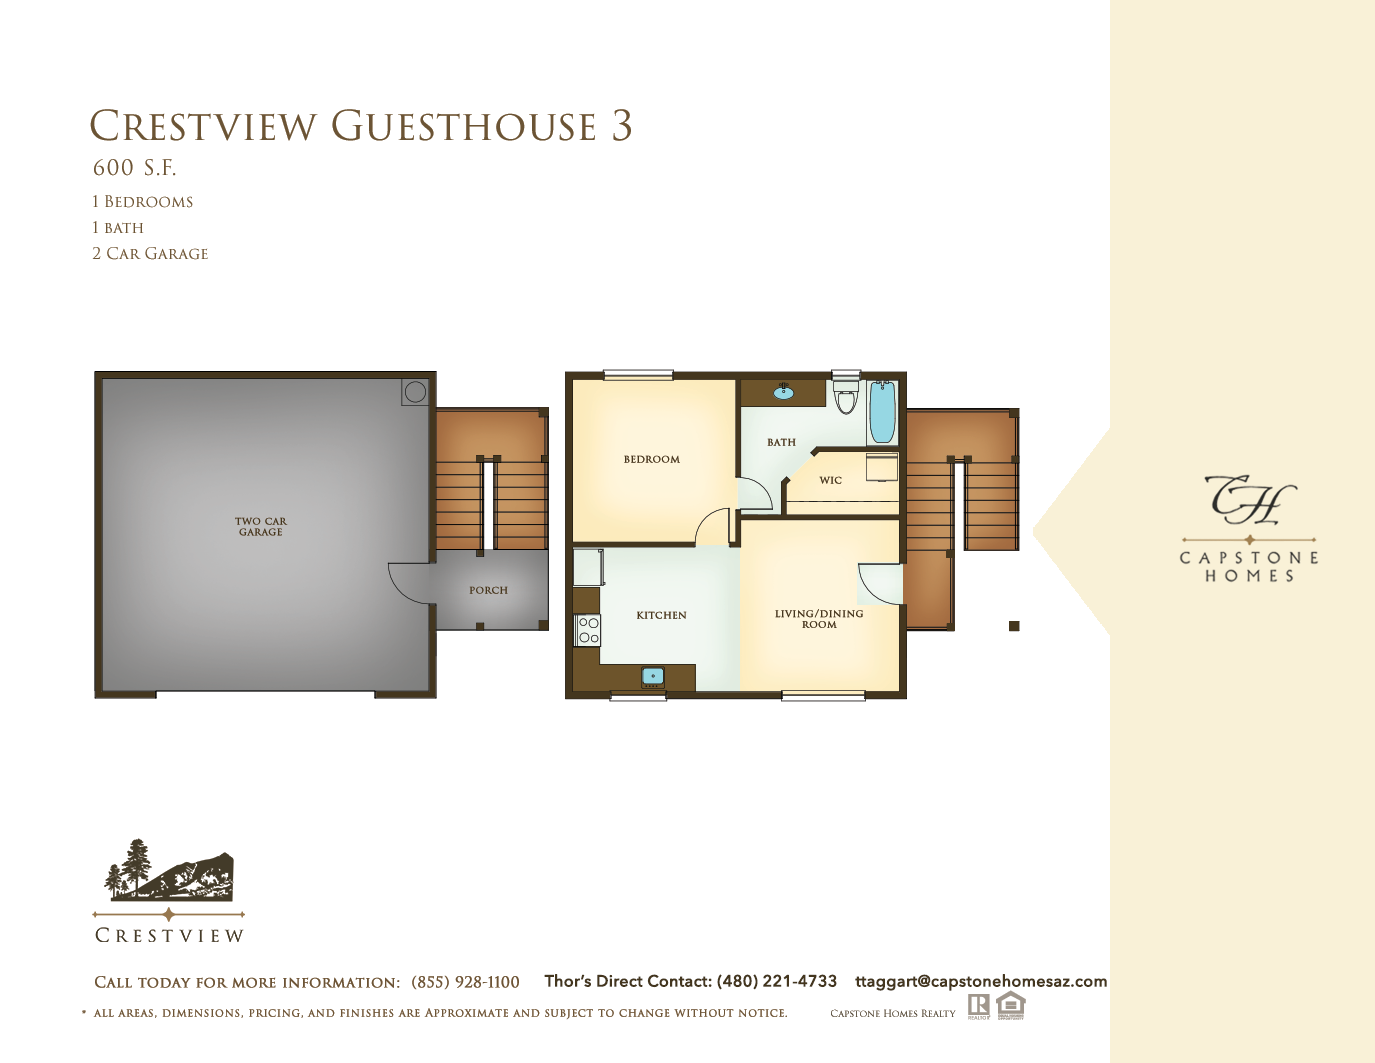 CVGuesthouse3Floorplan